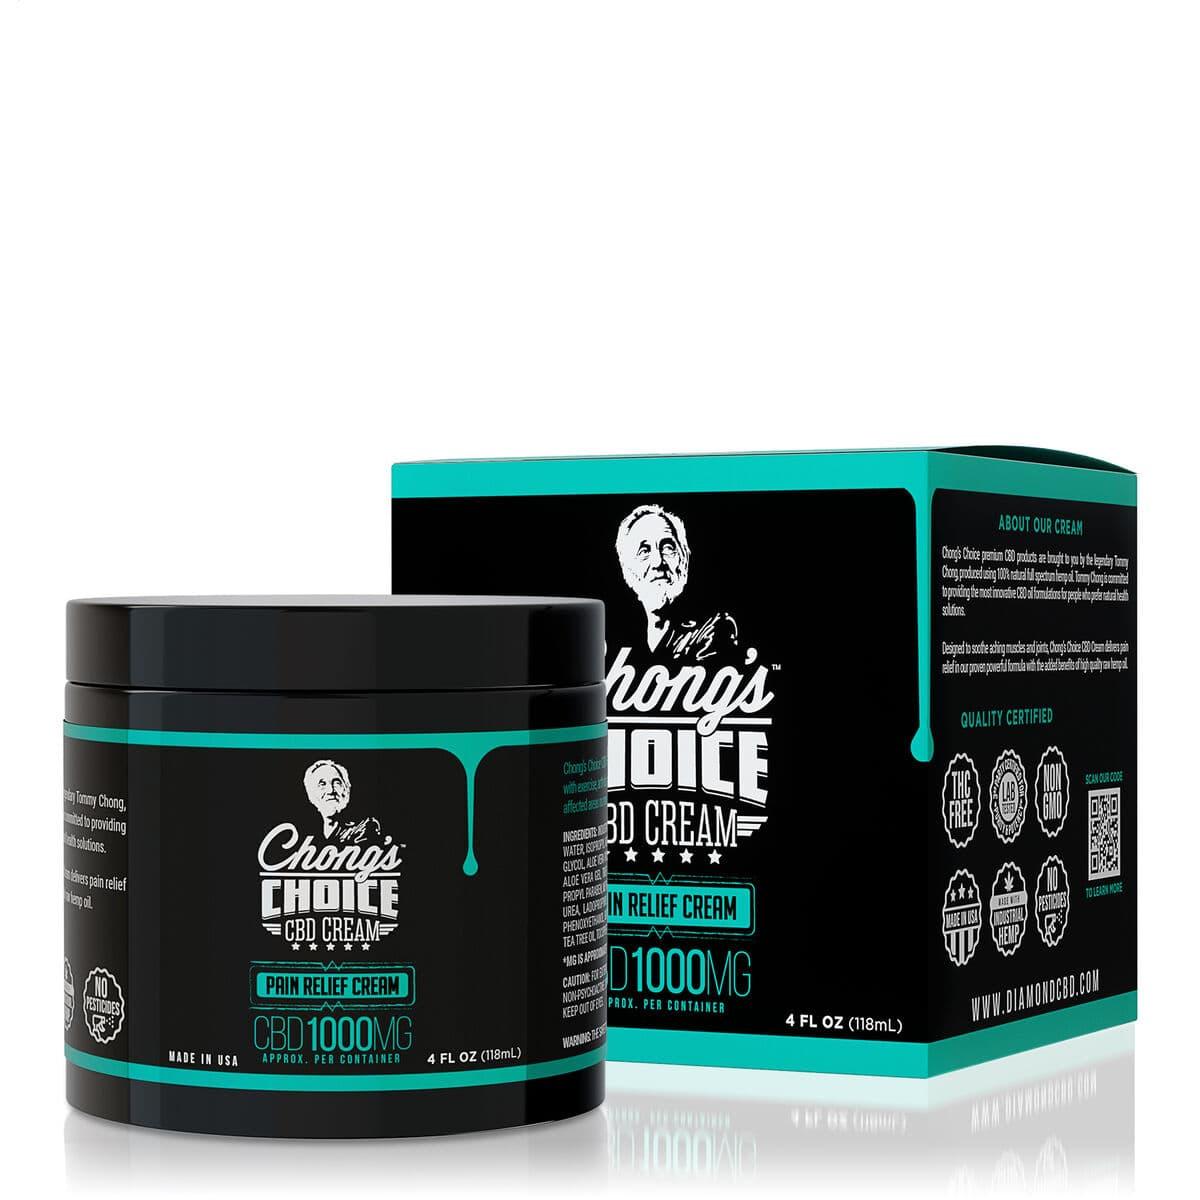 Chong's Choice, CBD Cream, Pain Relief, Broad Spectrum THC-Free, 4oz, 1000mg CBD (1)